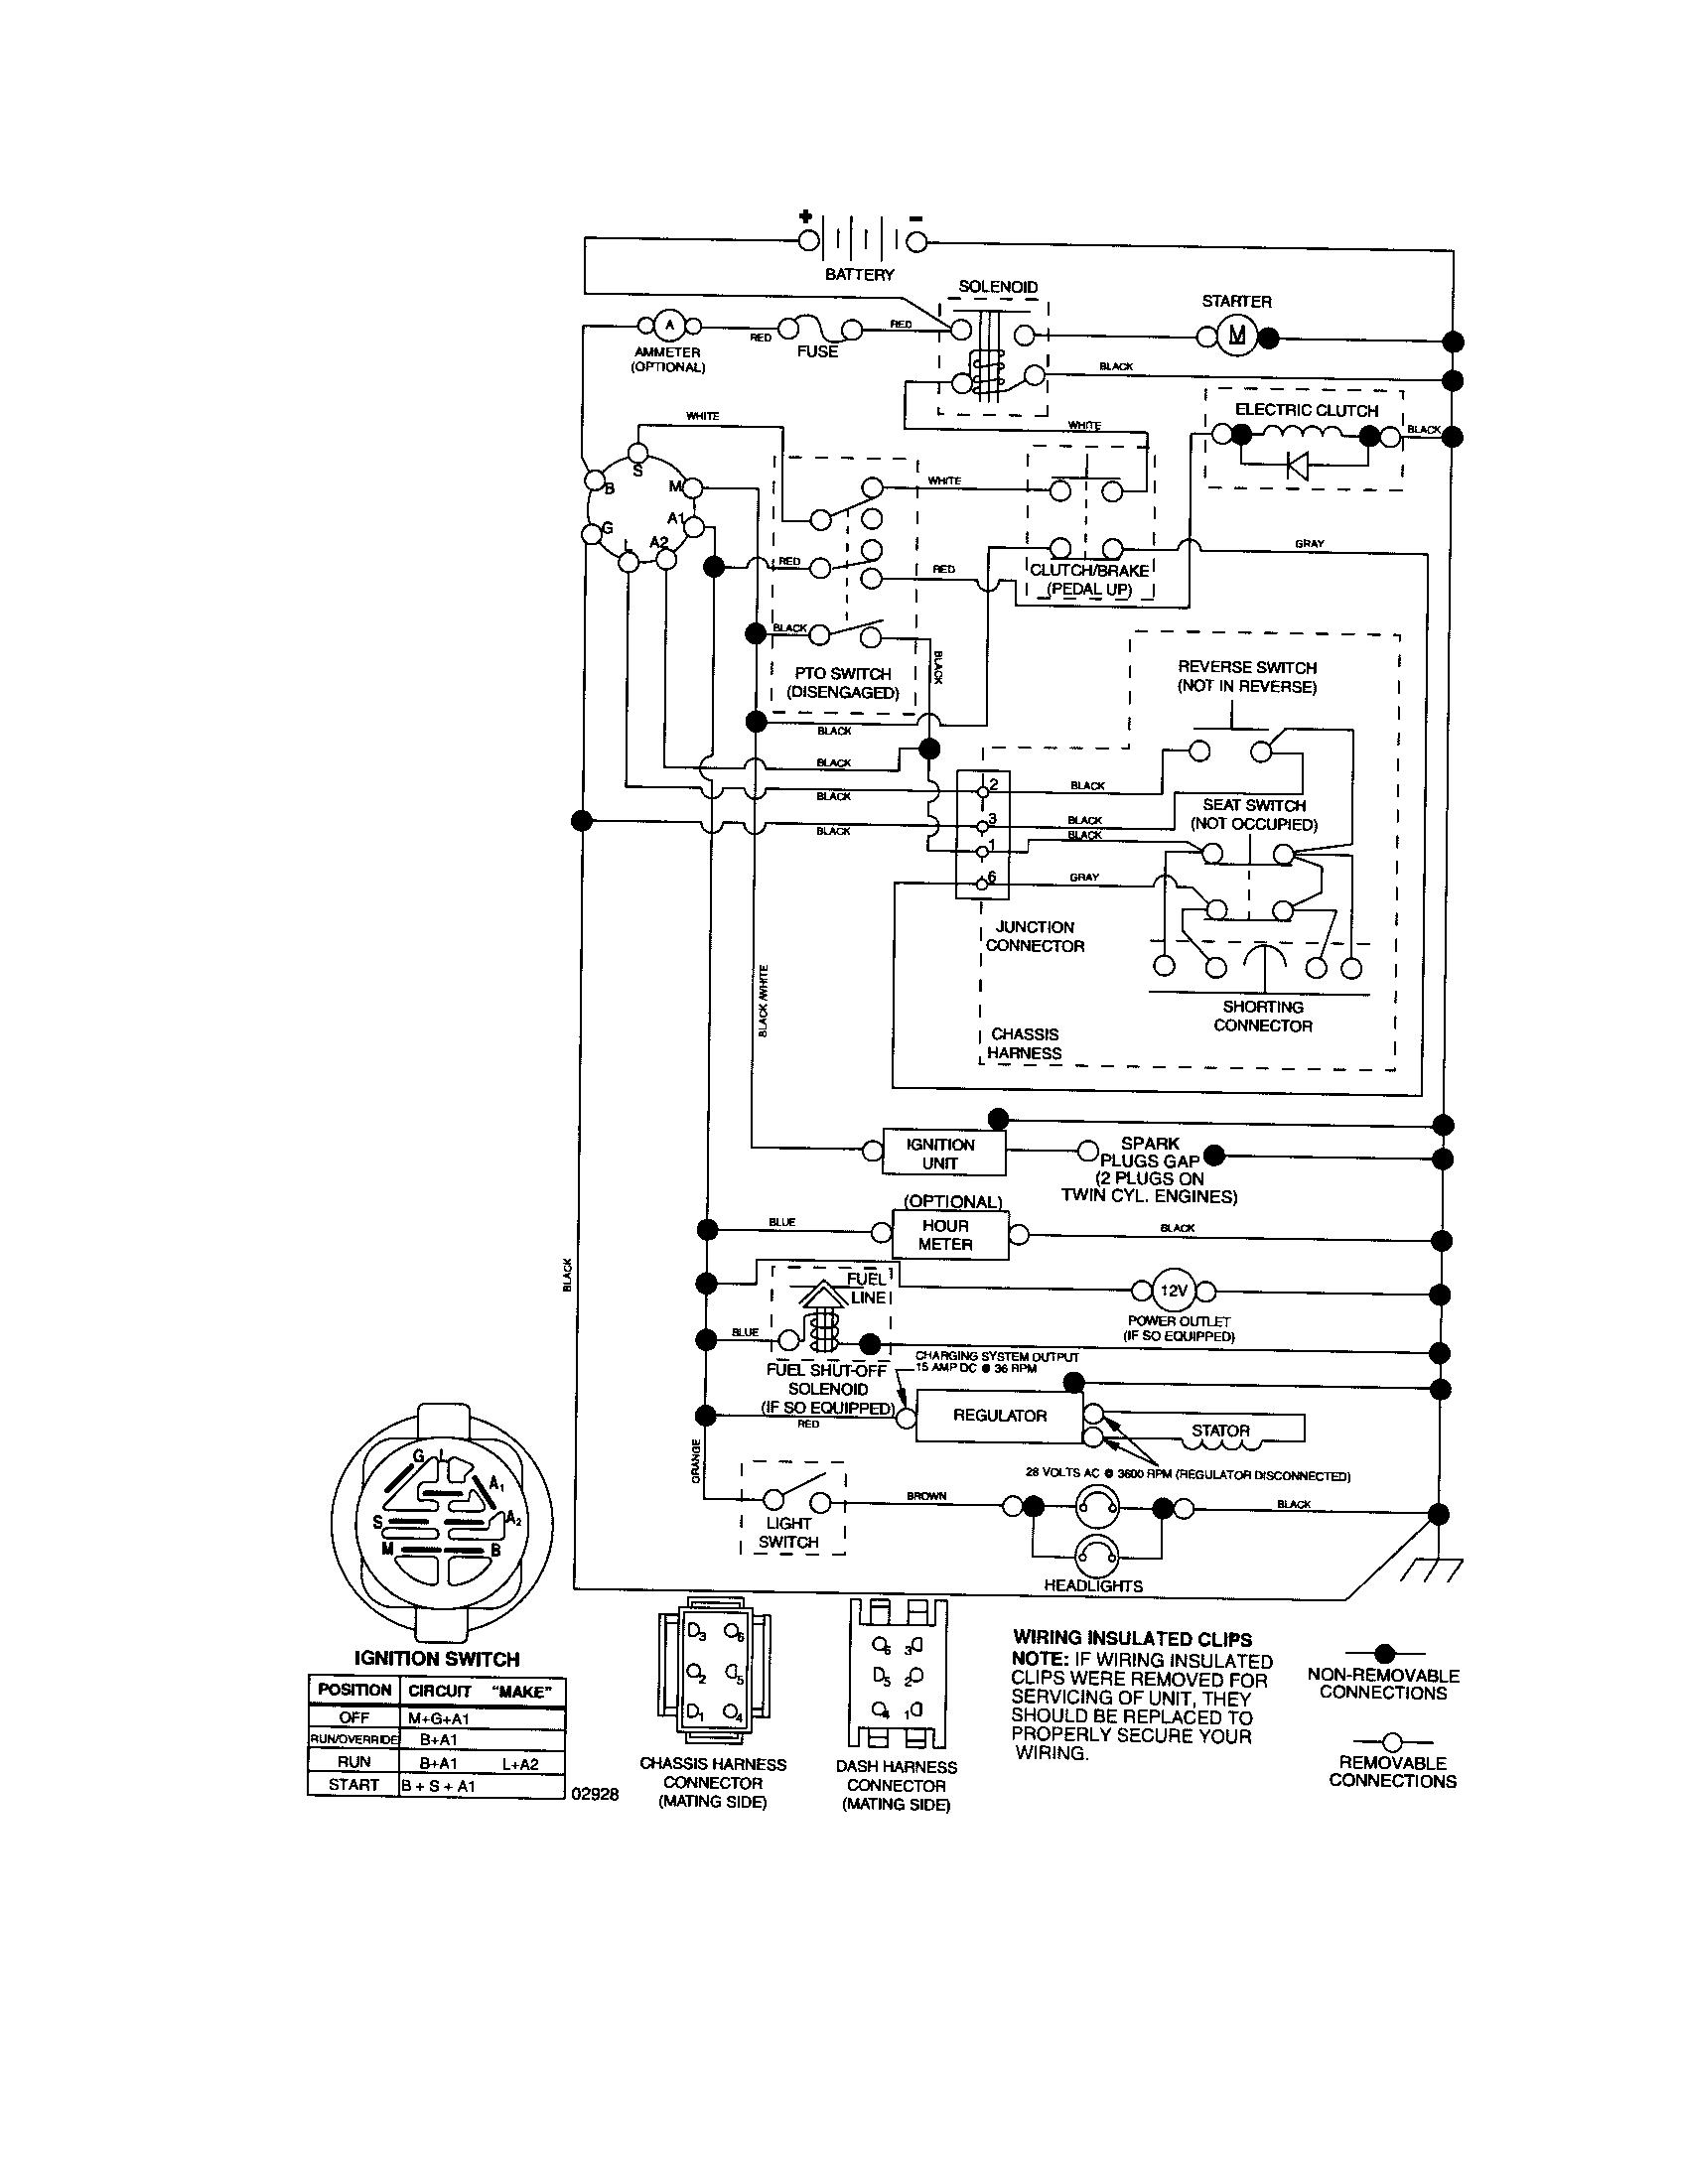 wiring diagram for craftsman 917 276922 riding lawn mower wiring rh friendsoffido co